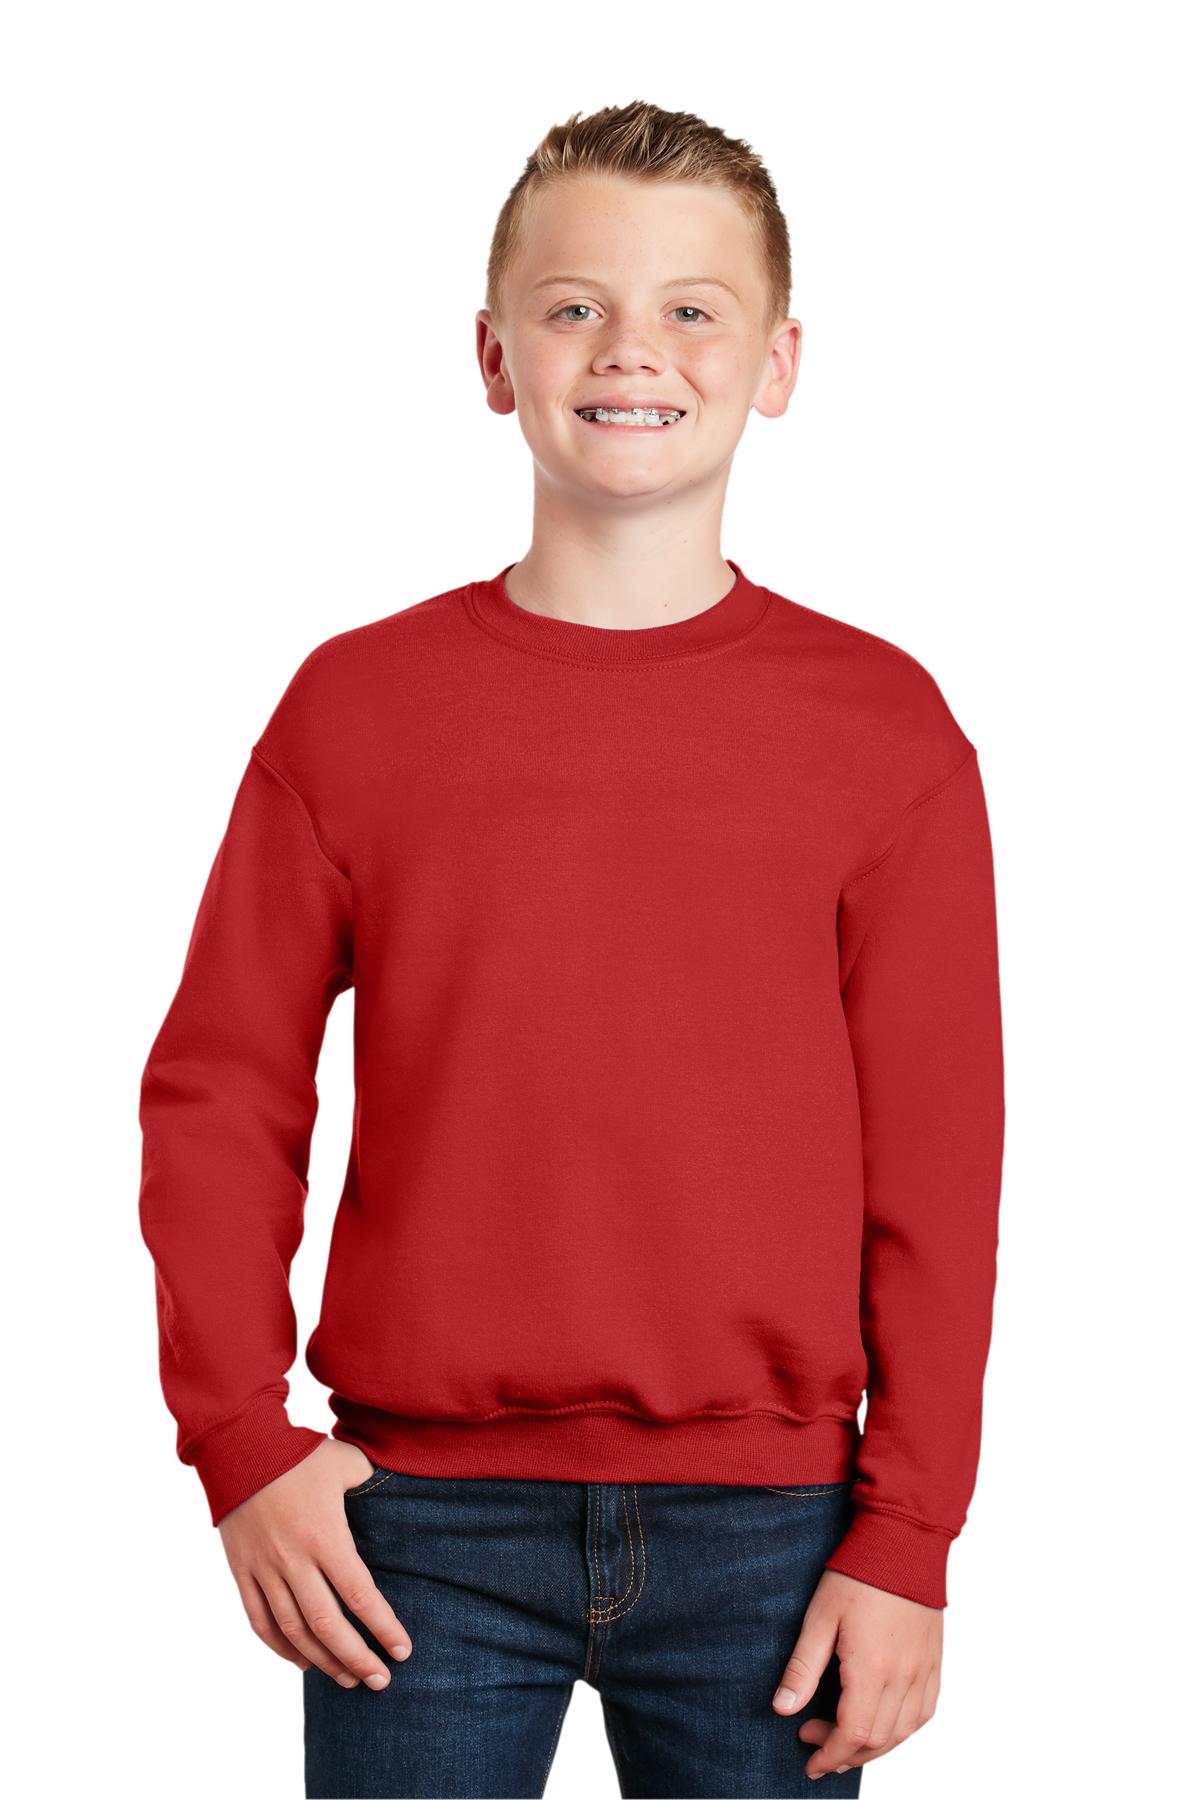 Gildan Heavy Blend youth crew neck sweatshirt Black M